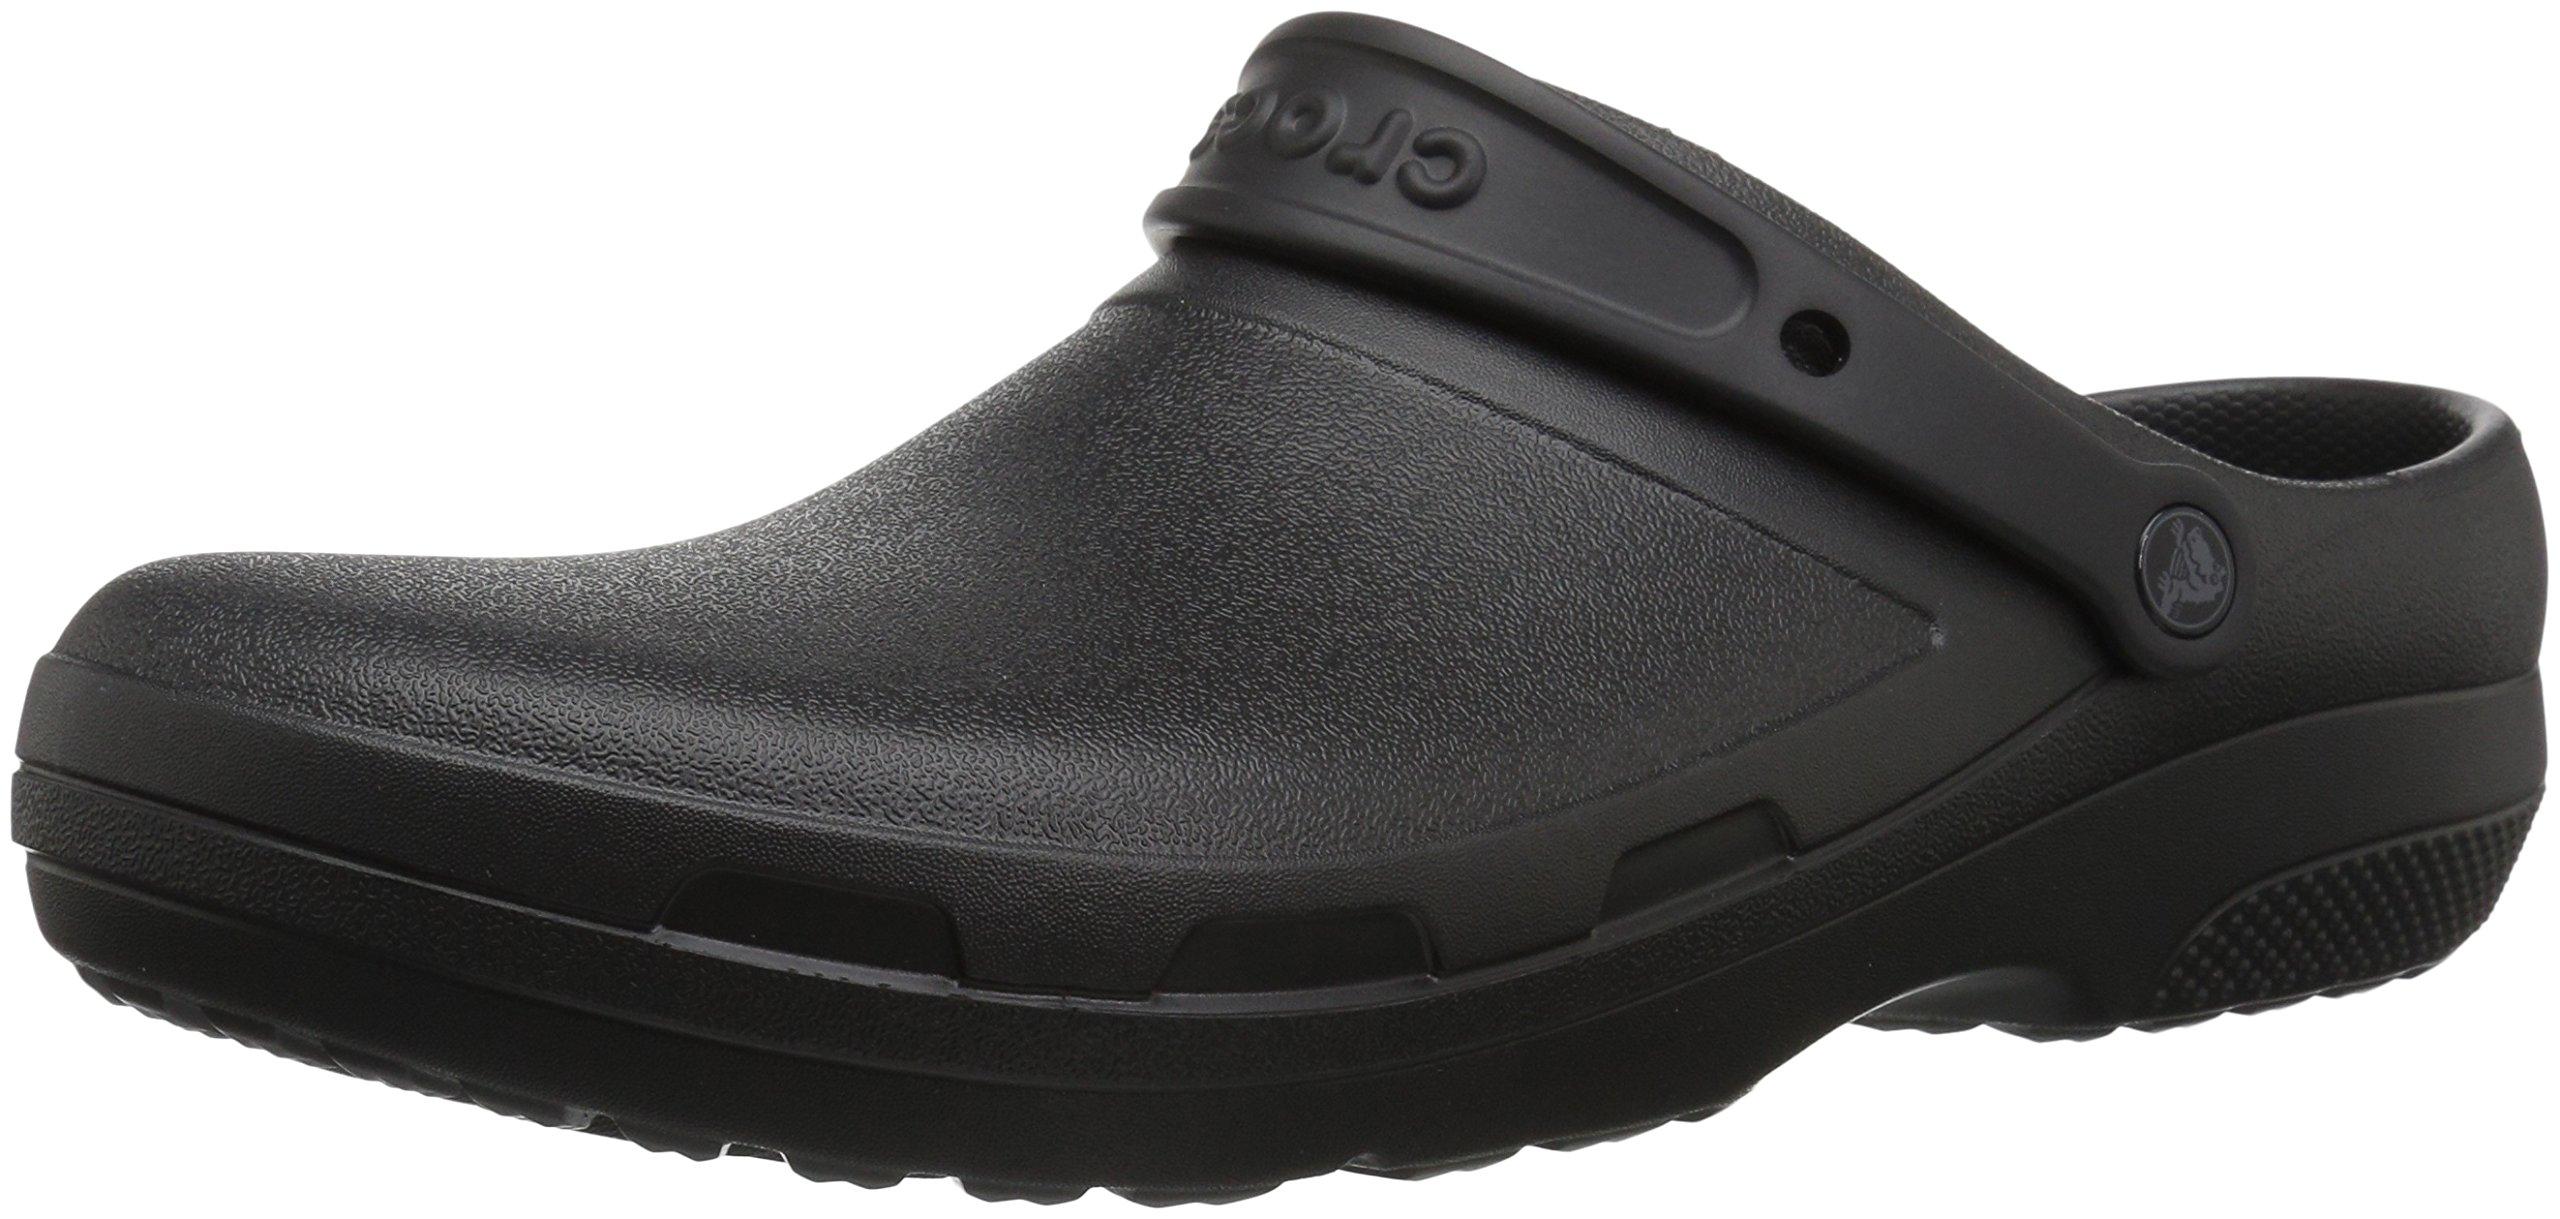 Crocs Specialist II Clog U, Zuecos Unisex Adulto